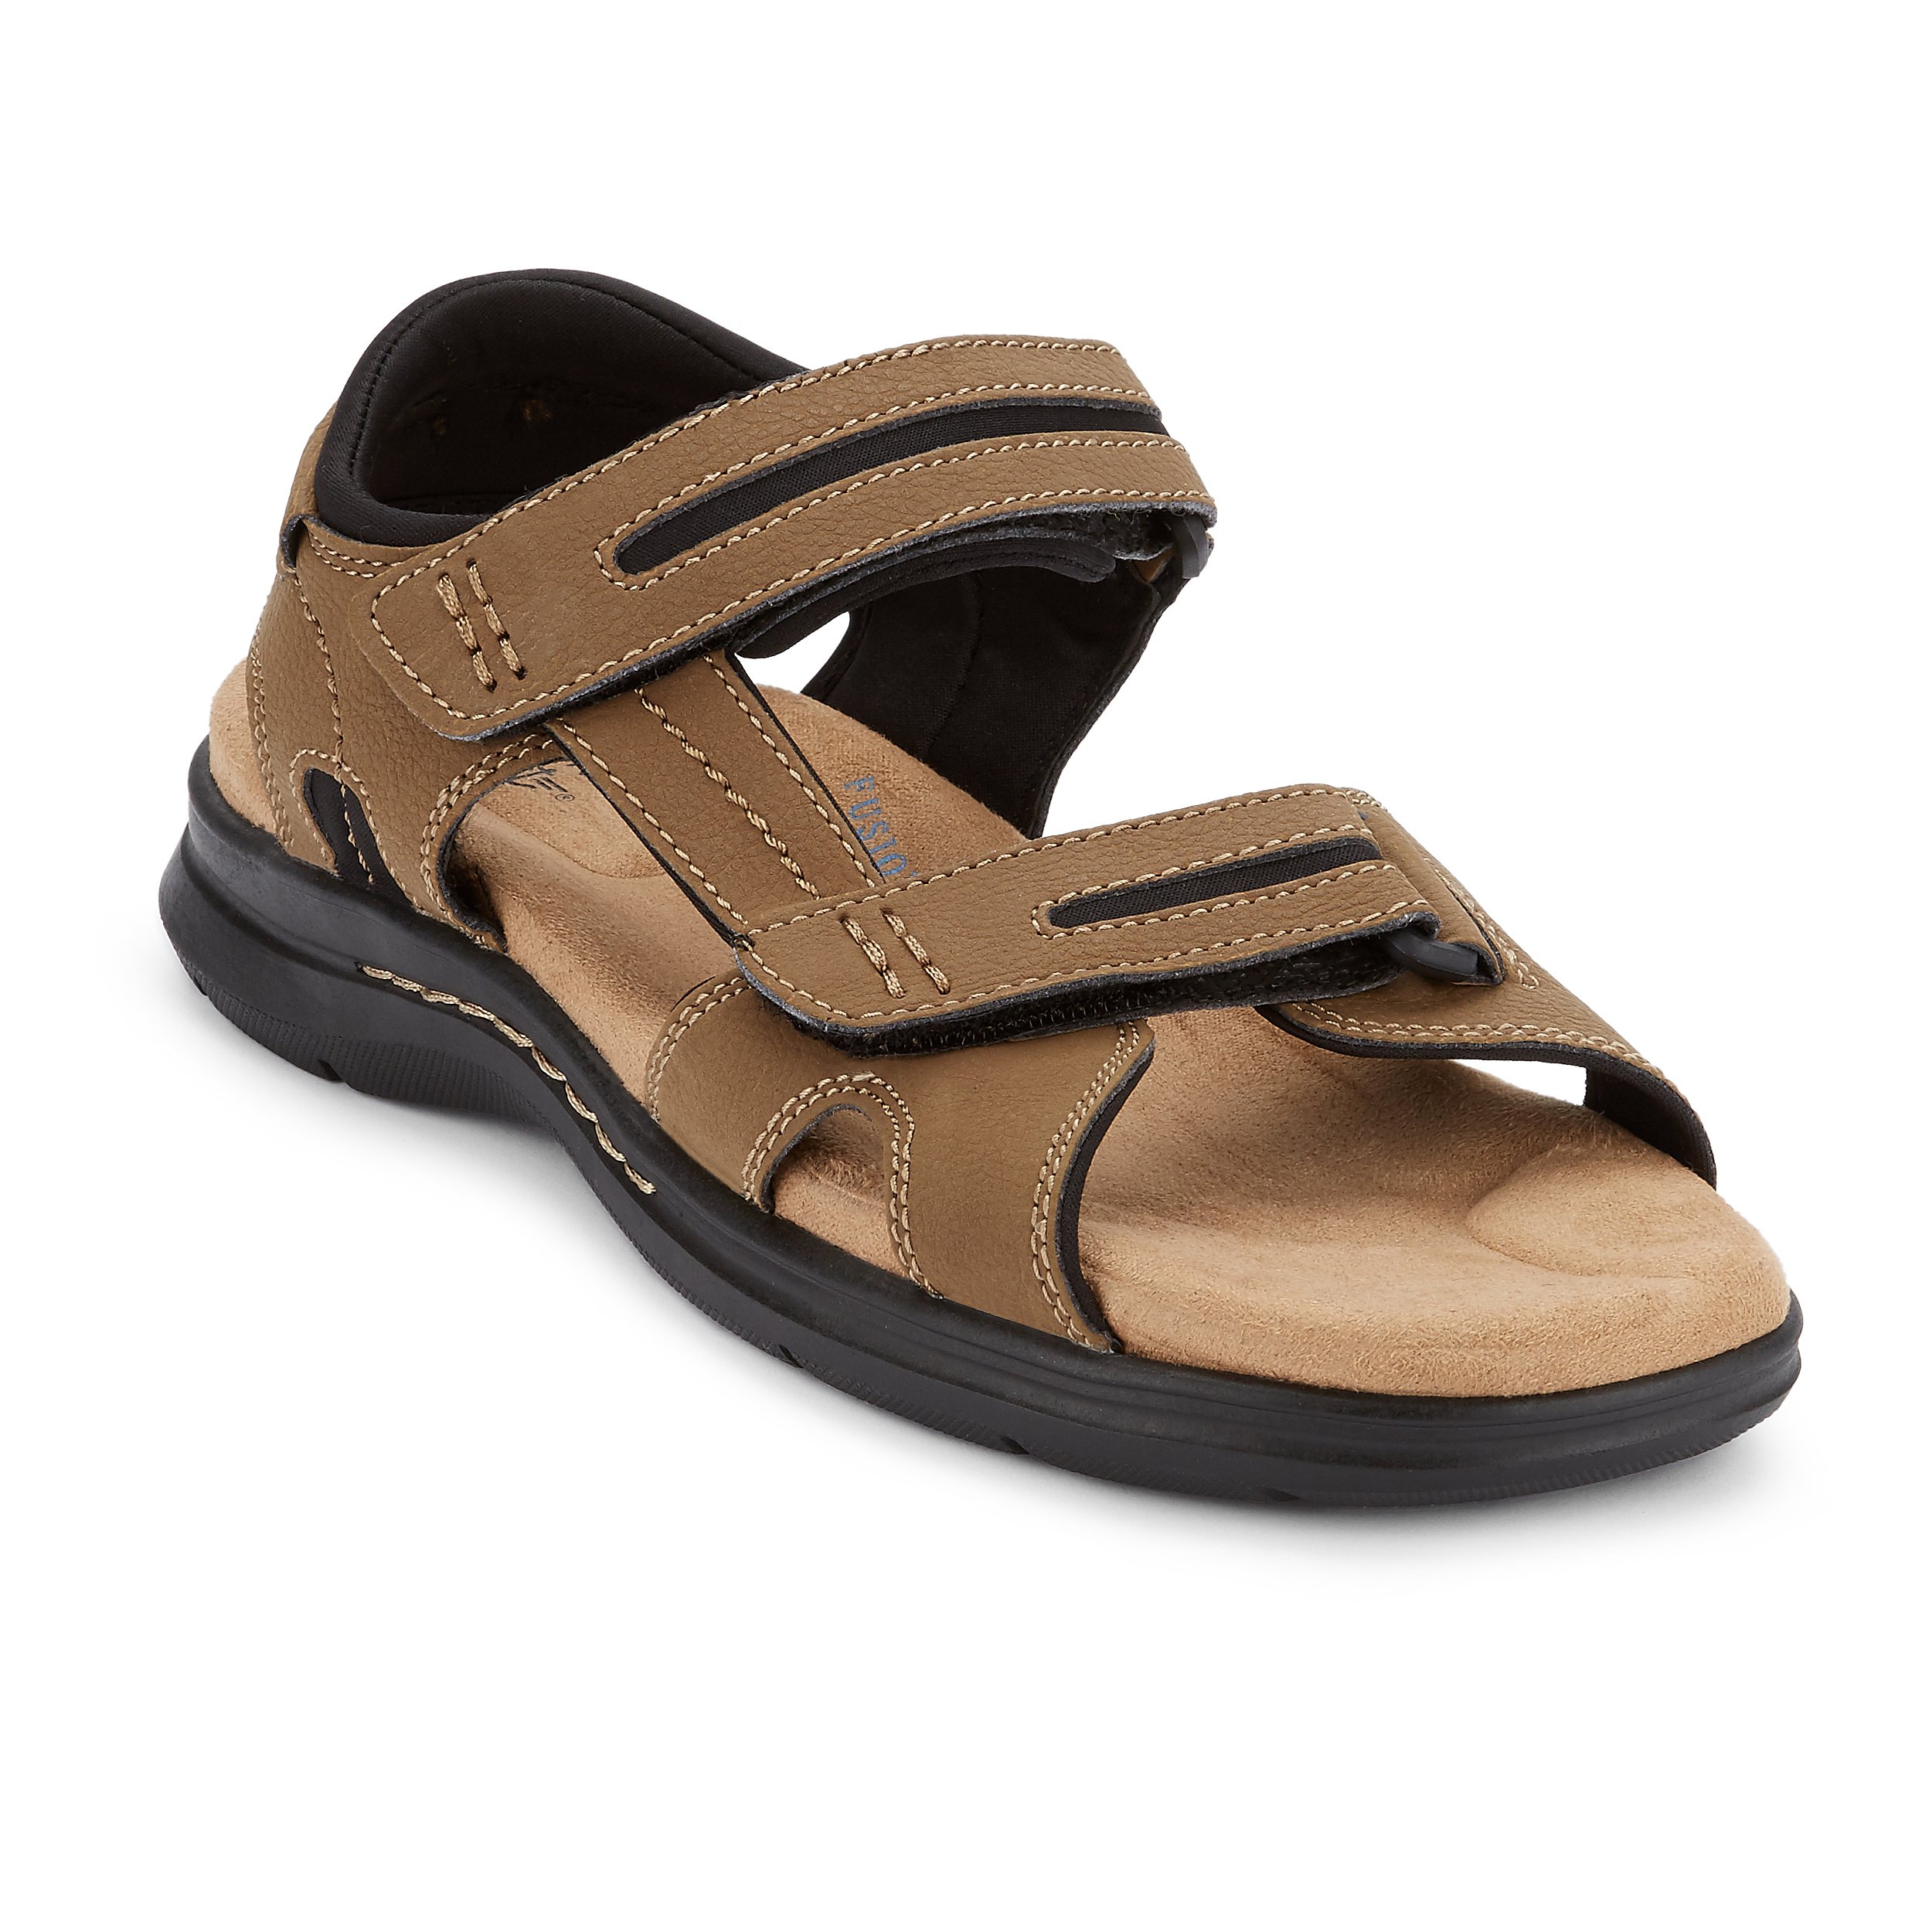 ea7c8f0e5cd5 Details about Dockers Mens Solano Casual Comfort Outdoor Sport Adjustable  Sandal Shoe